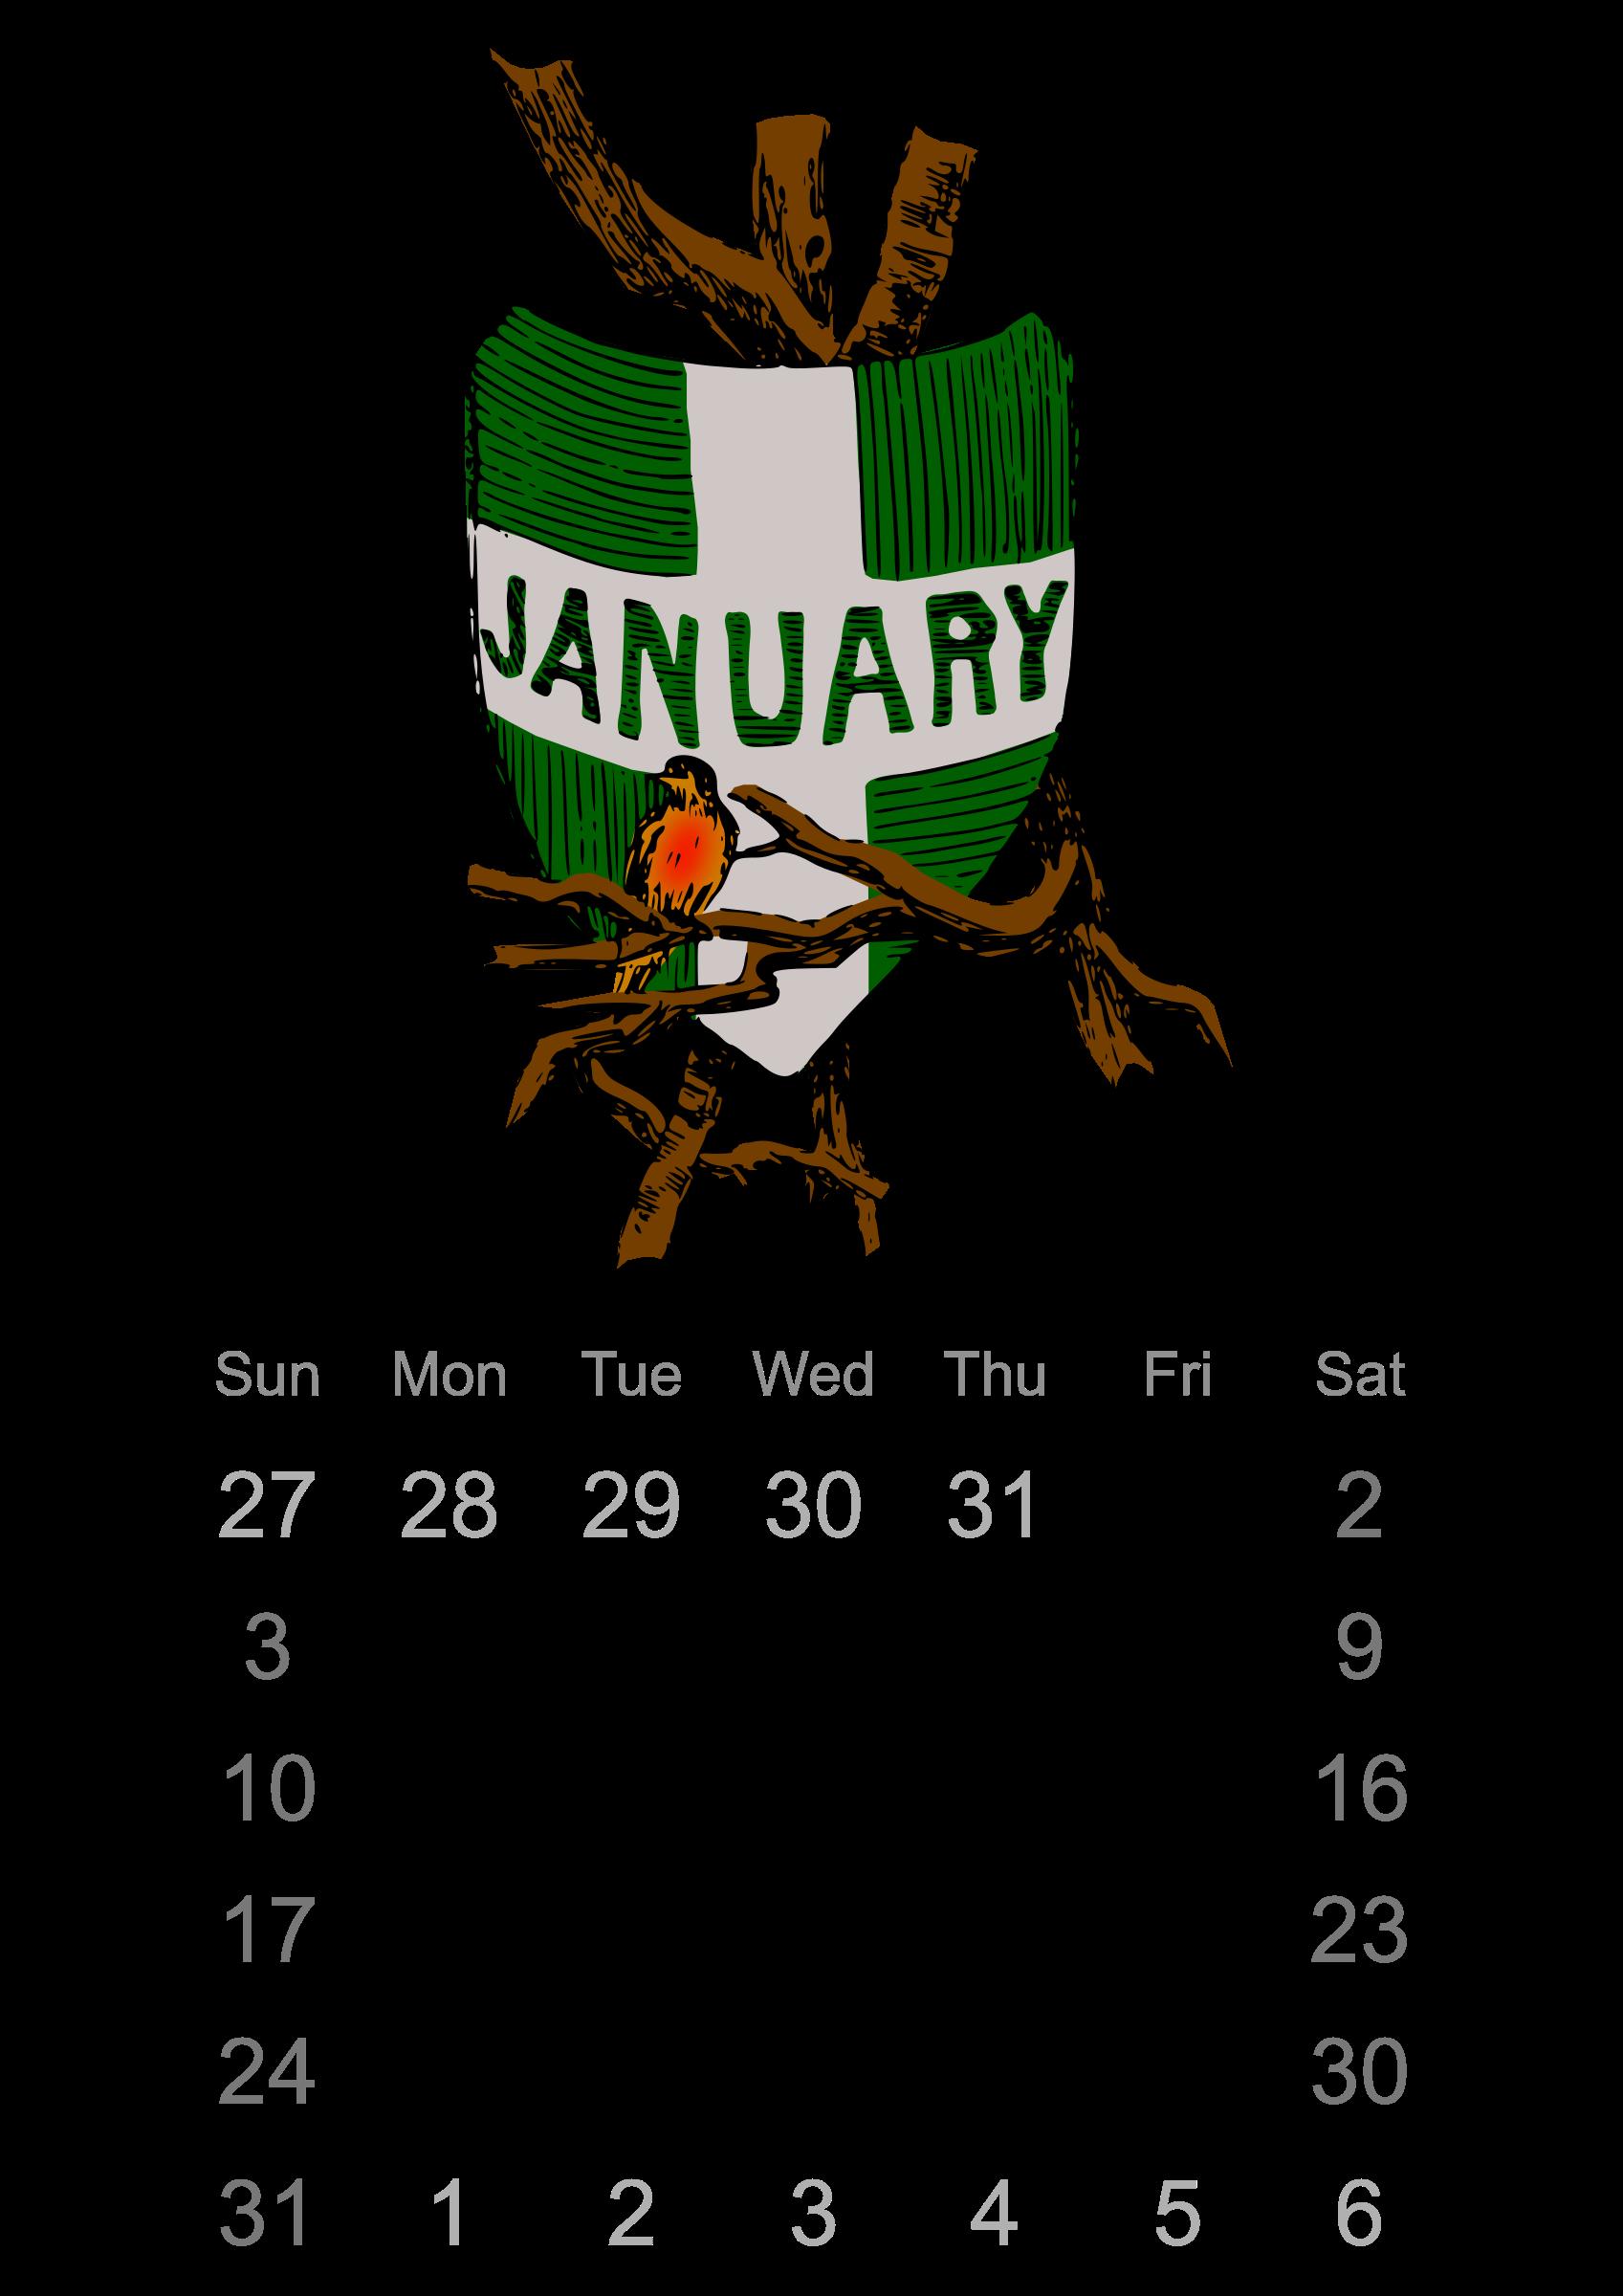 January clipart calendar. Big image png